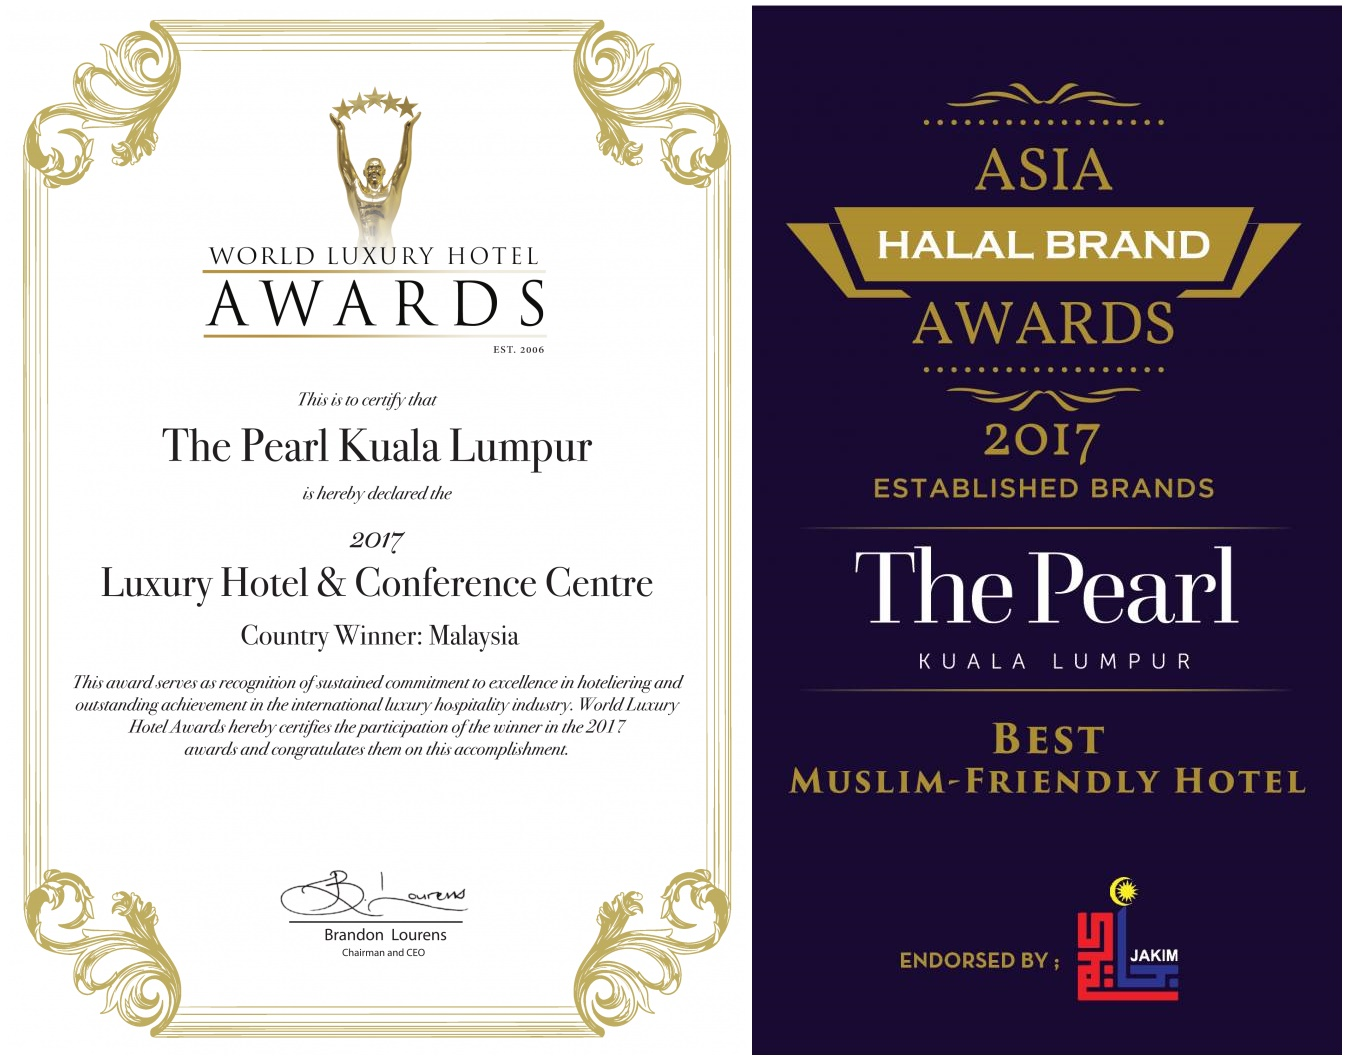 muslim friendly hotel in Kuala Lumpur